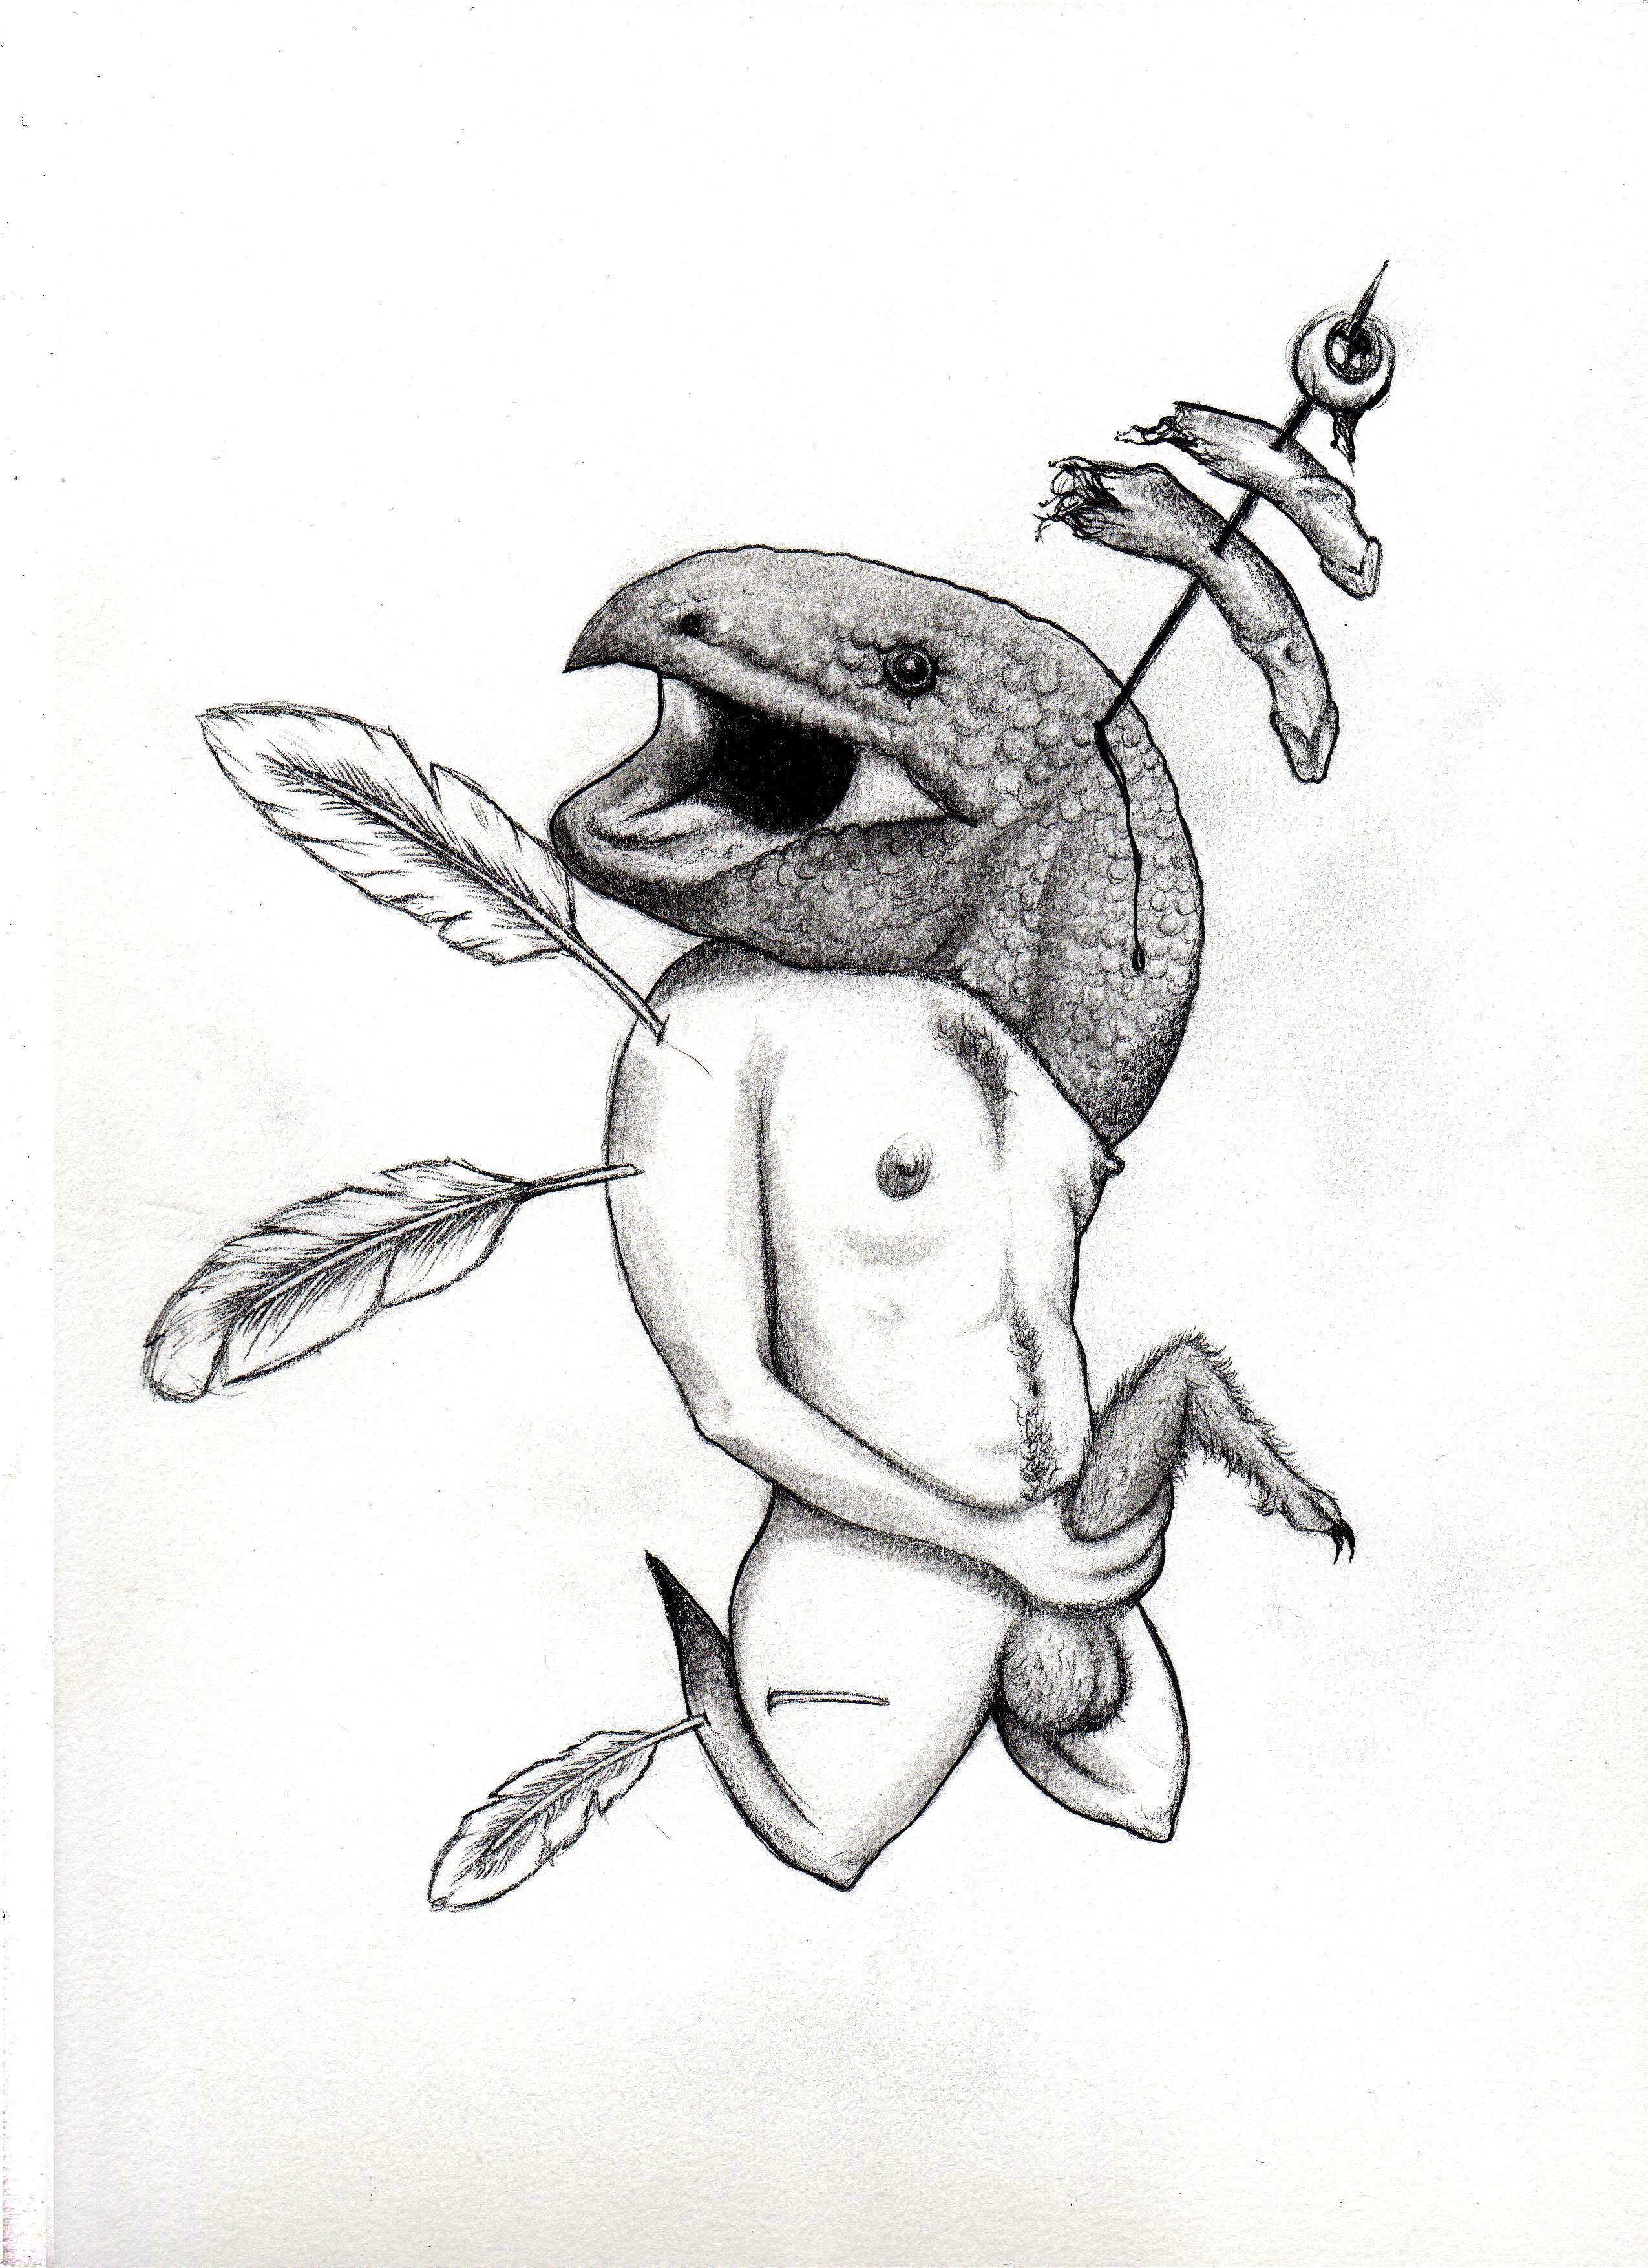 DORIAN WOOD; Sin título [Seguazine 11] (Grafito sobre papel, 22,8 x 30,5 cm).